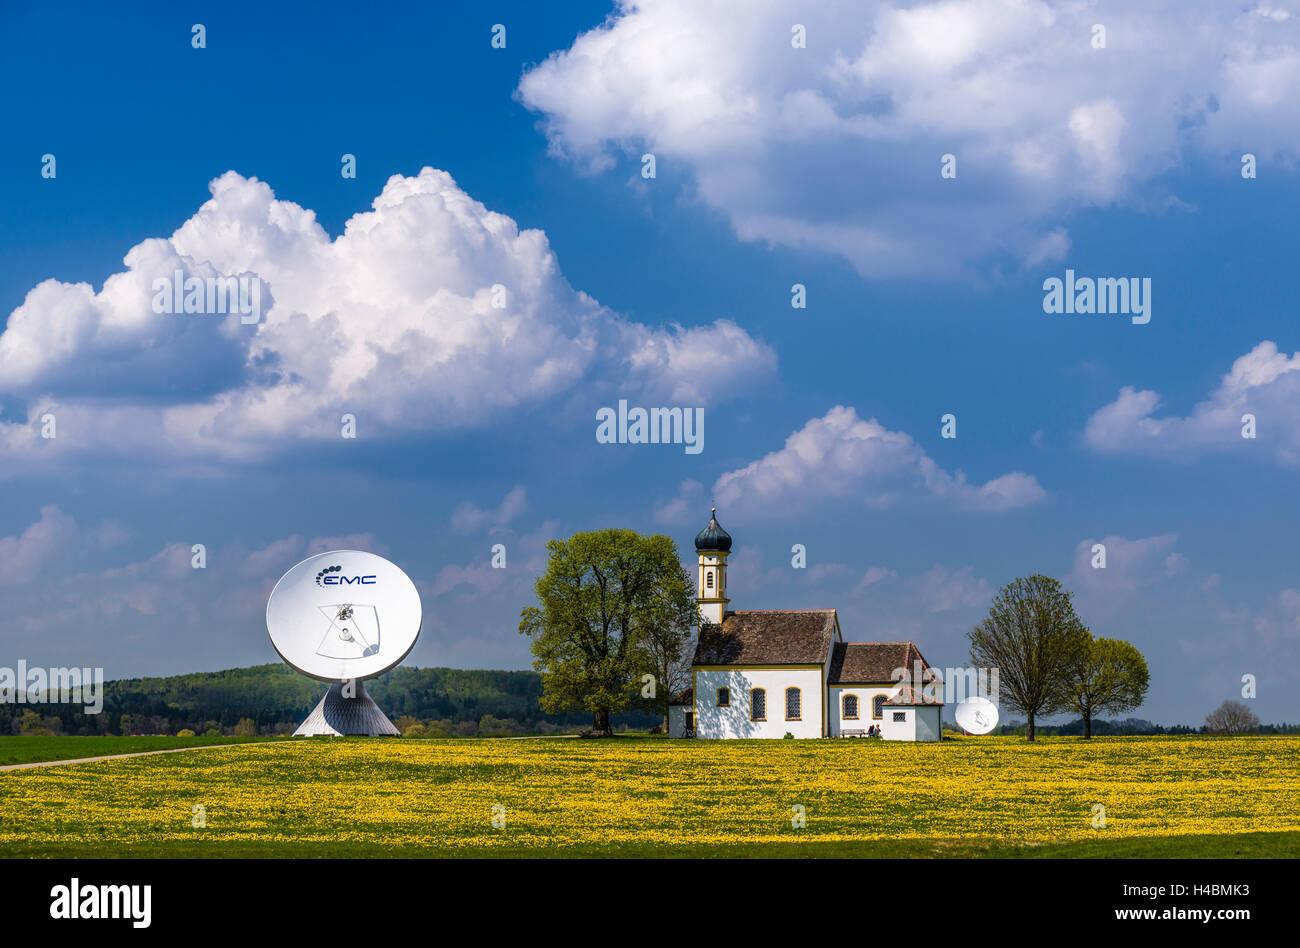 Germany, Bavaria, Upper Bavaria, Fünfseenland, Ammersee region, Raisting, church Saint Johann, dish aerials - Stock Image